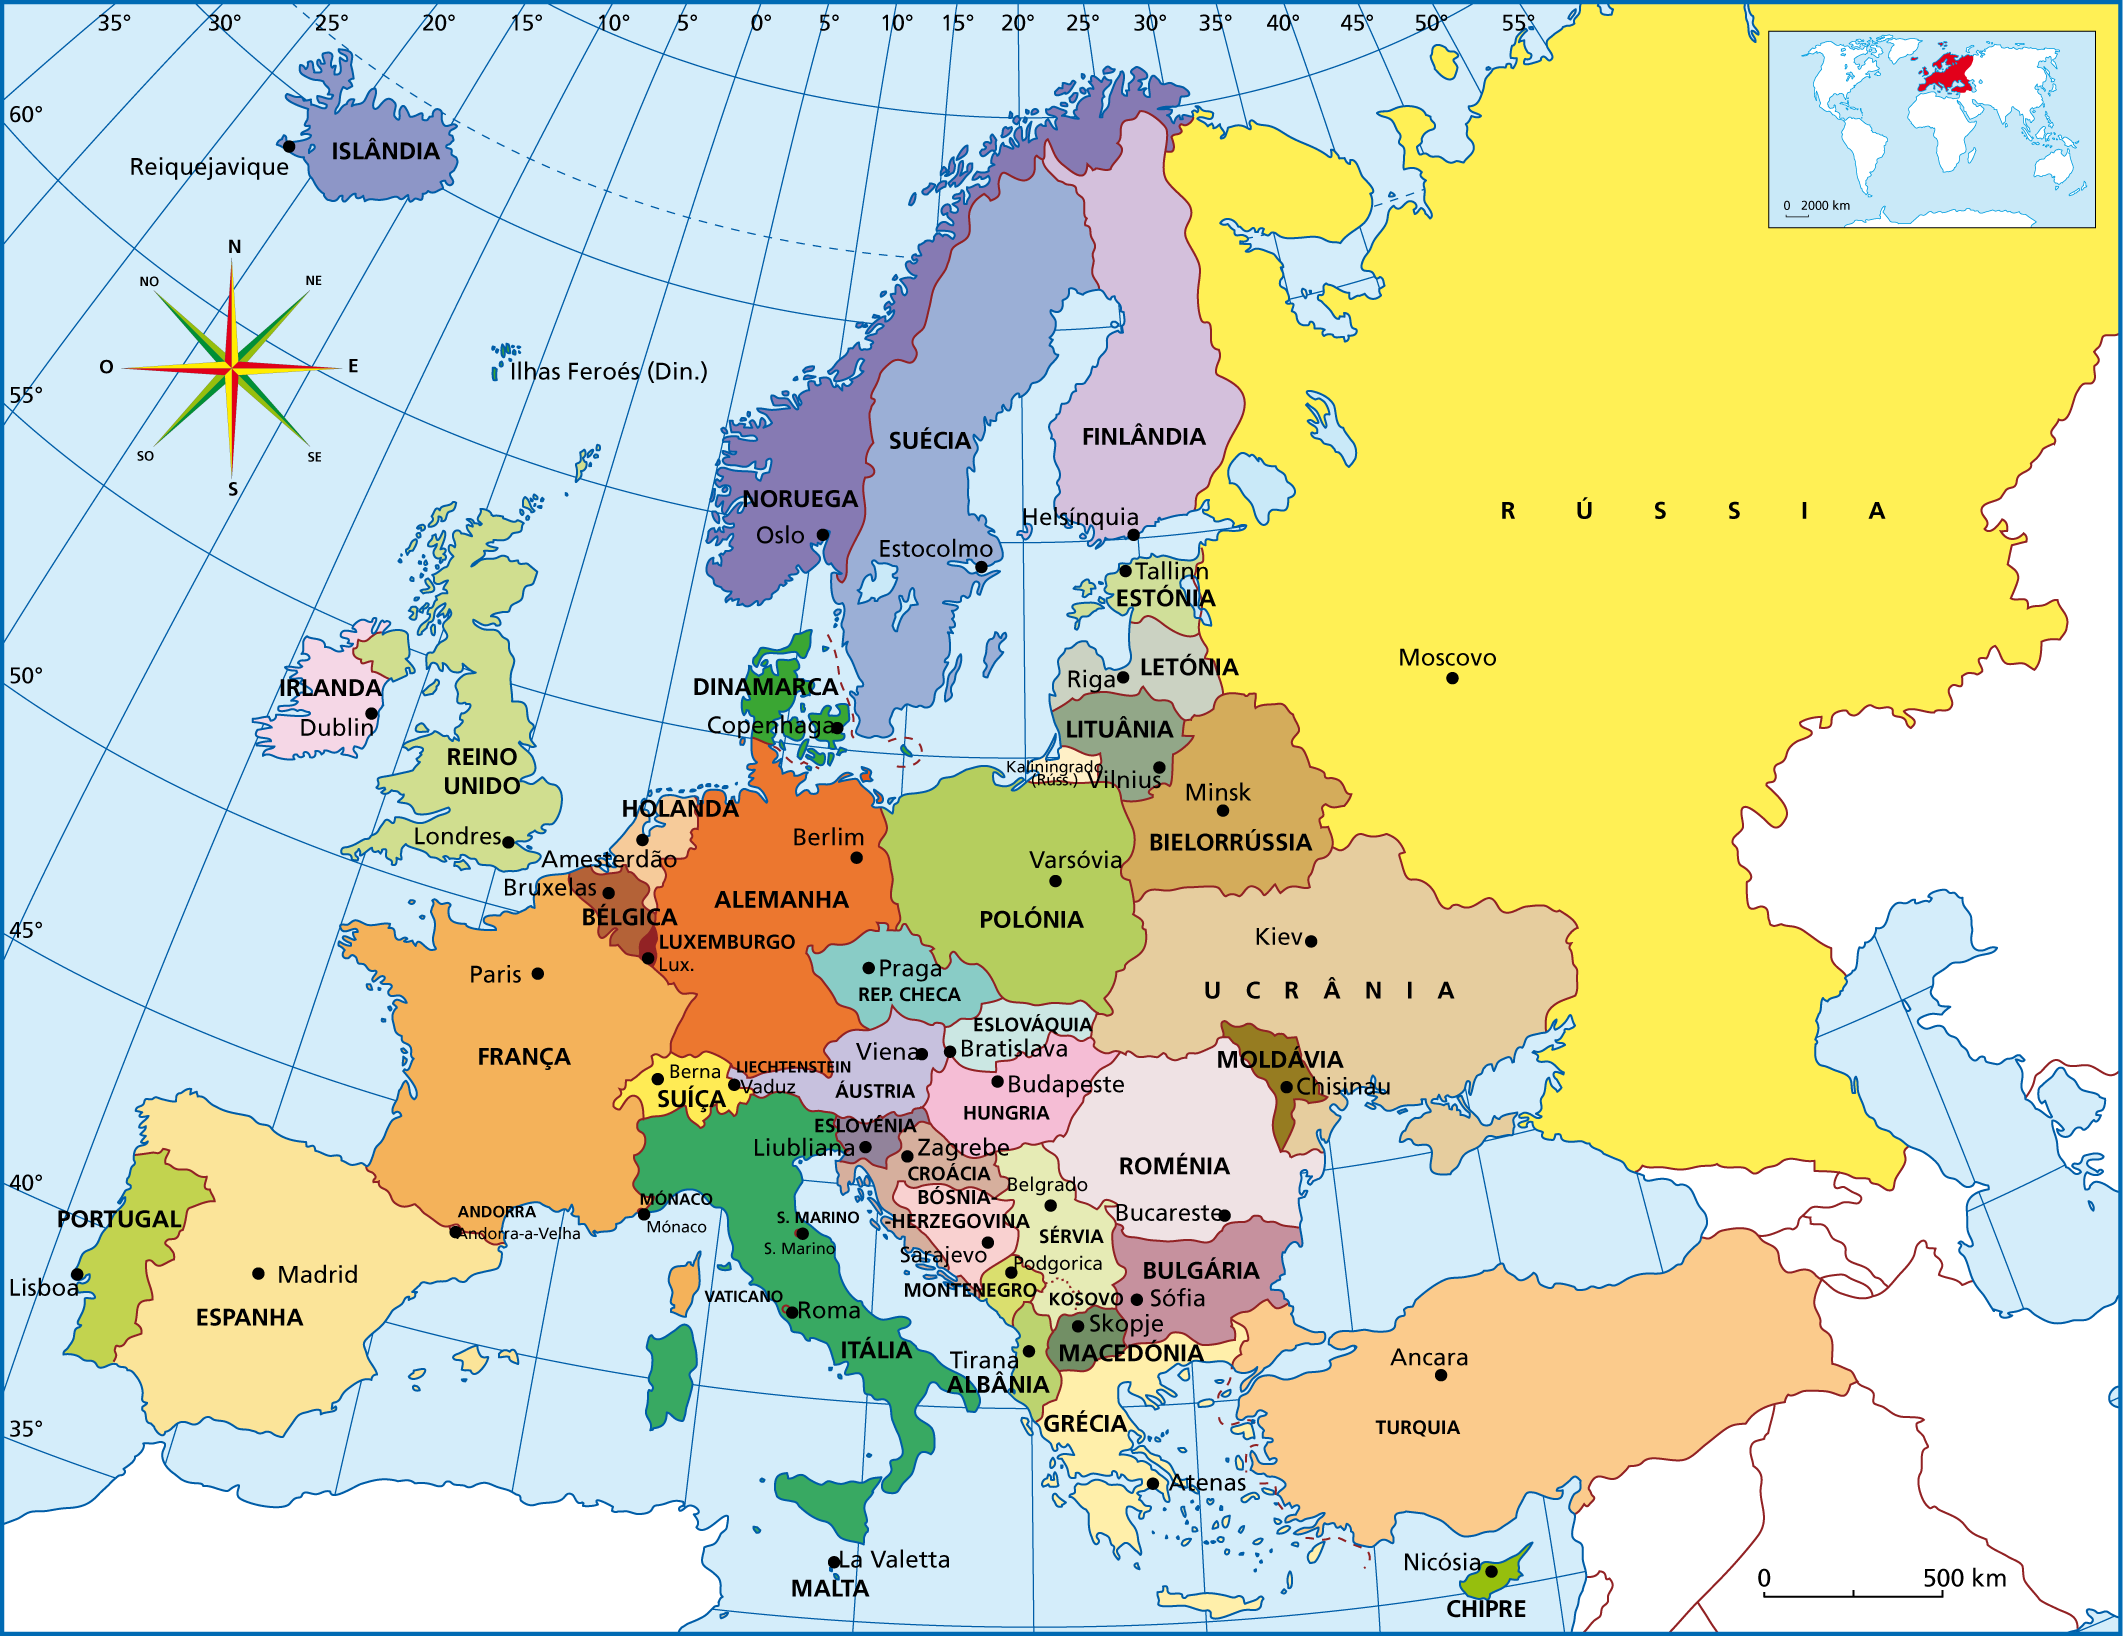 Resultado de imagem para mapa mundi europa   Mapas   Pinterest